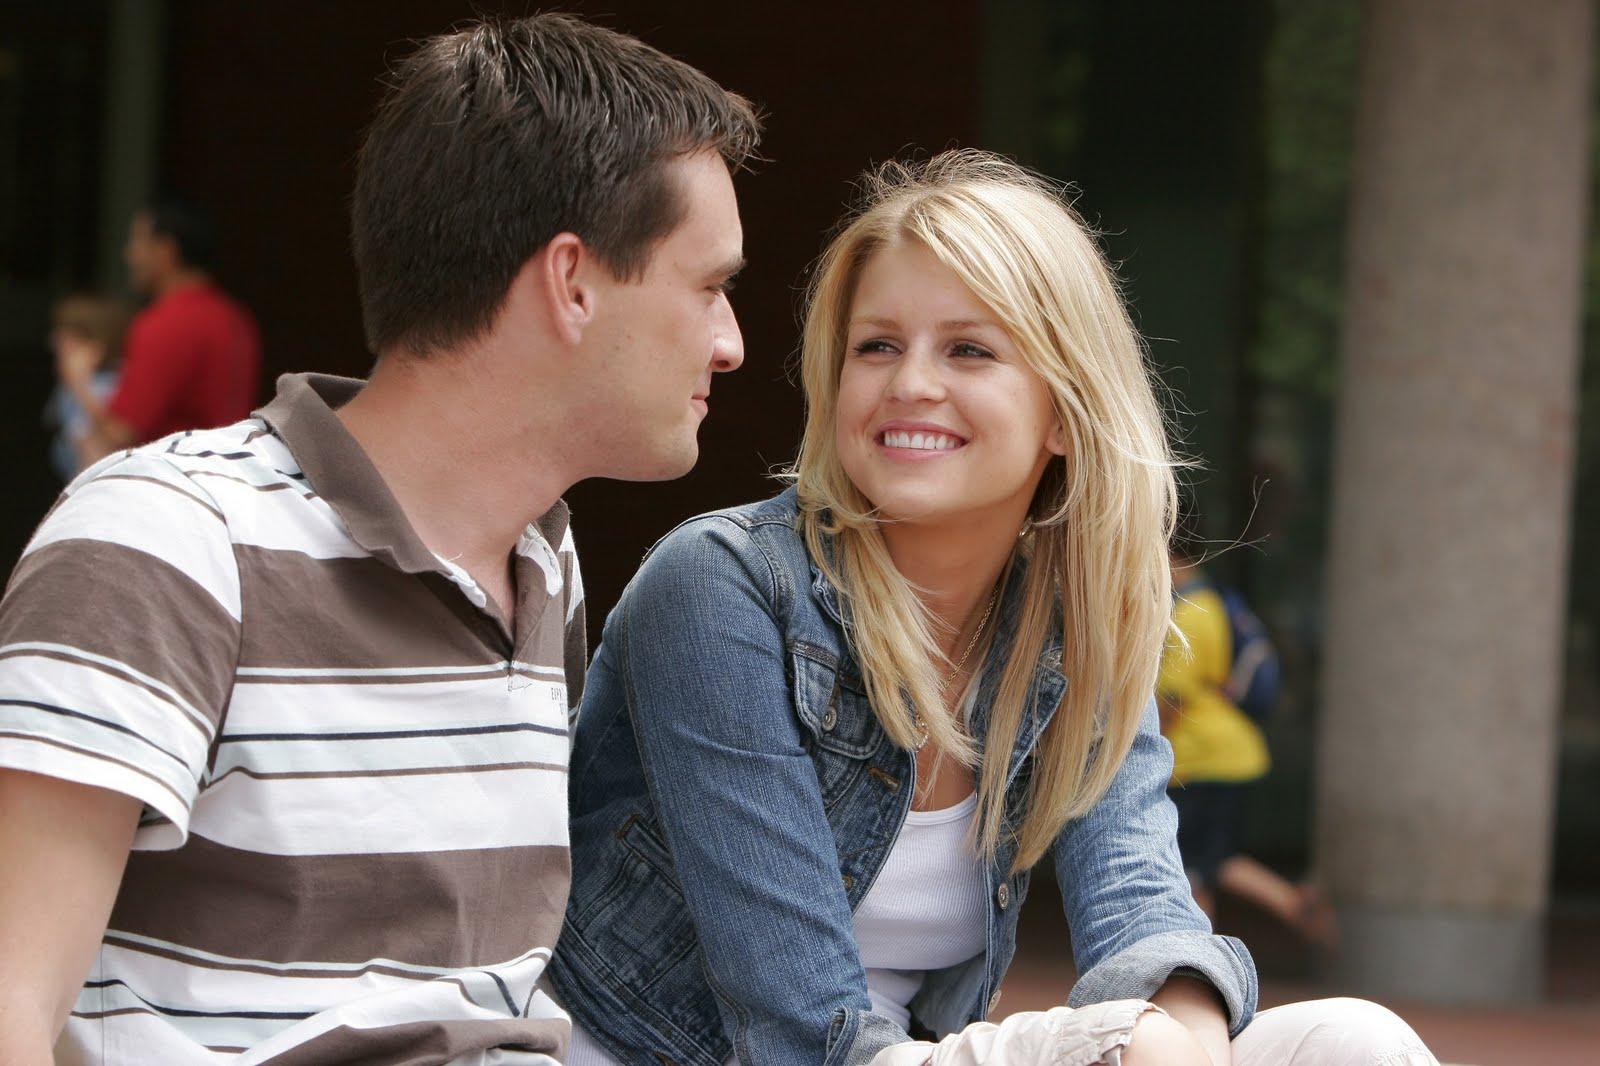 flirt free with girls